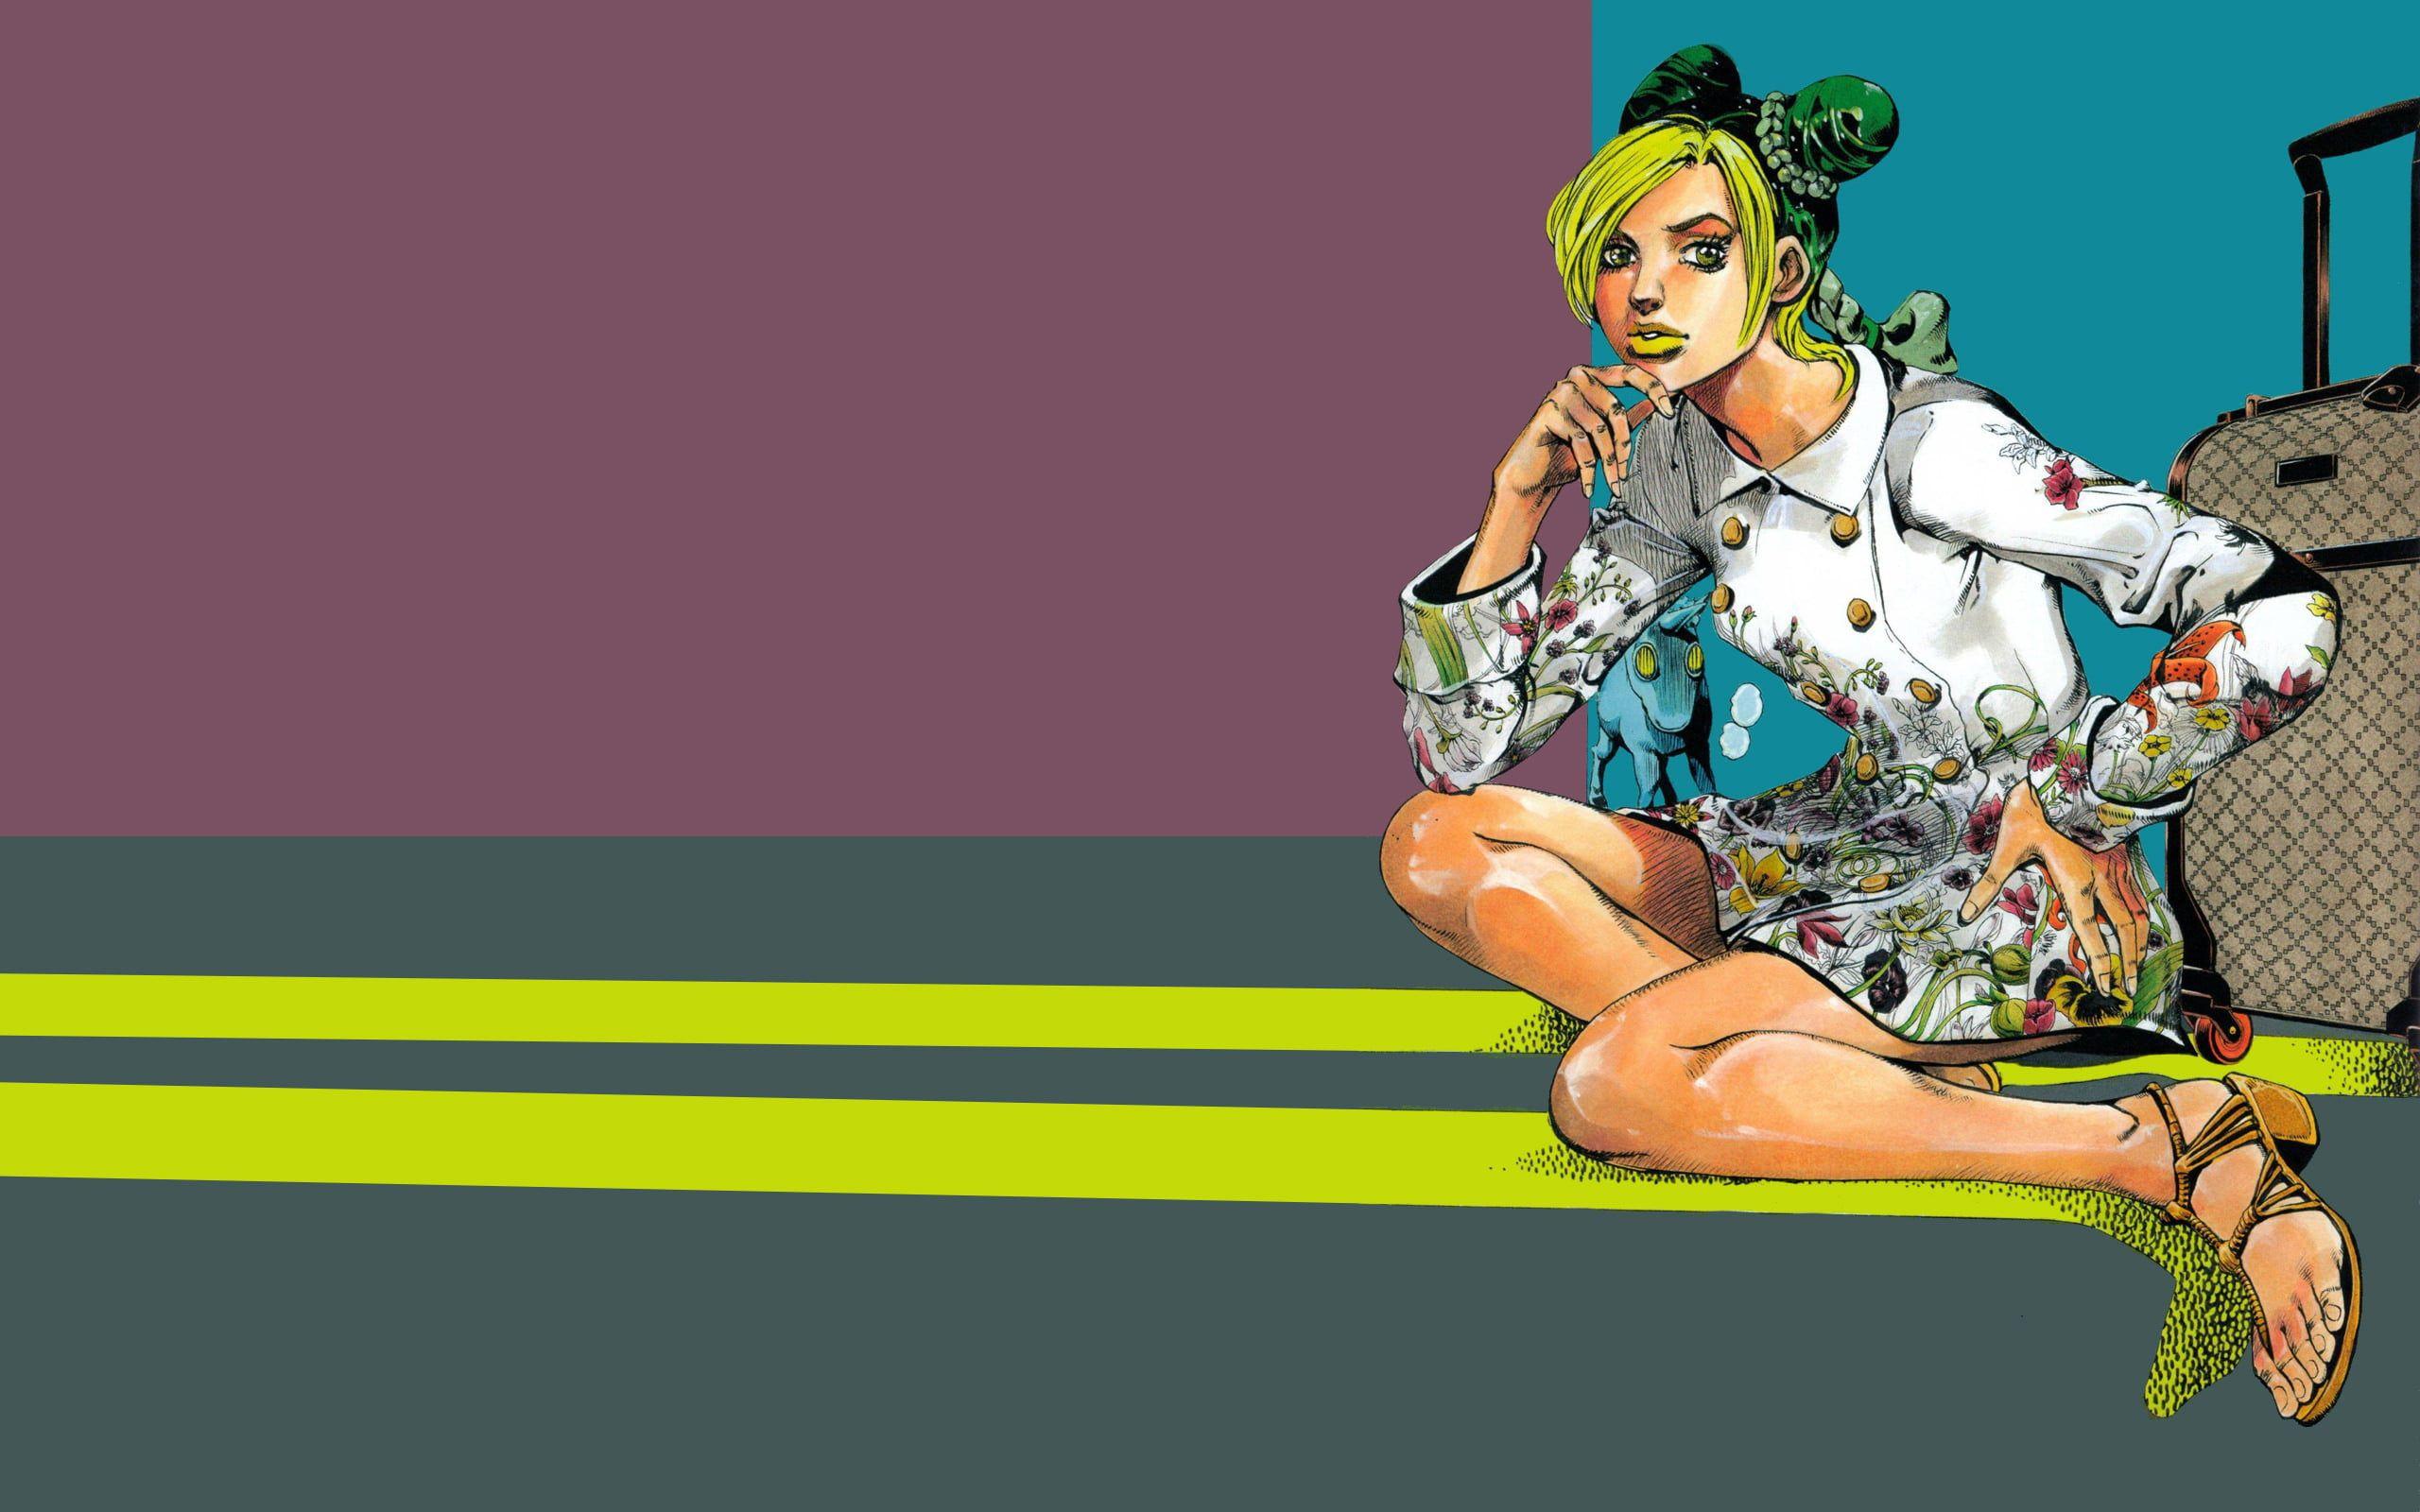 Jojo S Bizarre Adventure Anime Manga Hirohiko Araki Jolyne Cujoh 2k Wallpaper Hdwallpaper De In 2020 Jojo S Bizarre Adventure Jojo Bizarre Jojo Bizzare Adventure